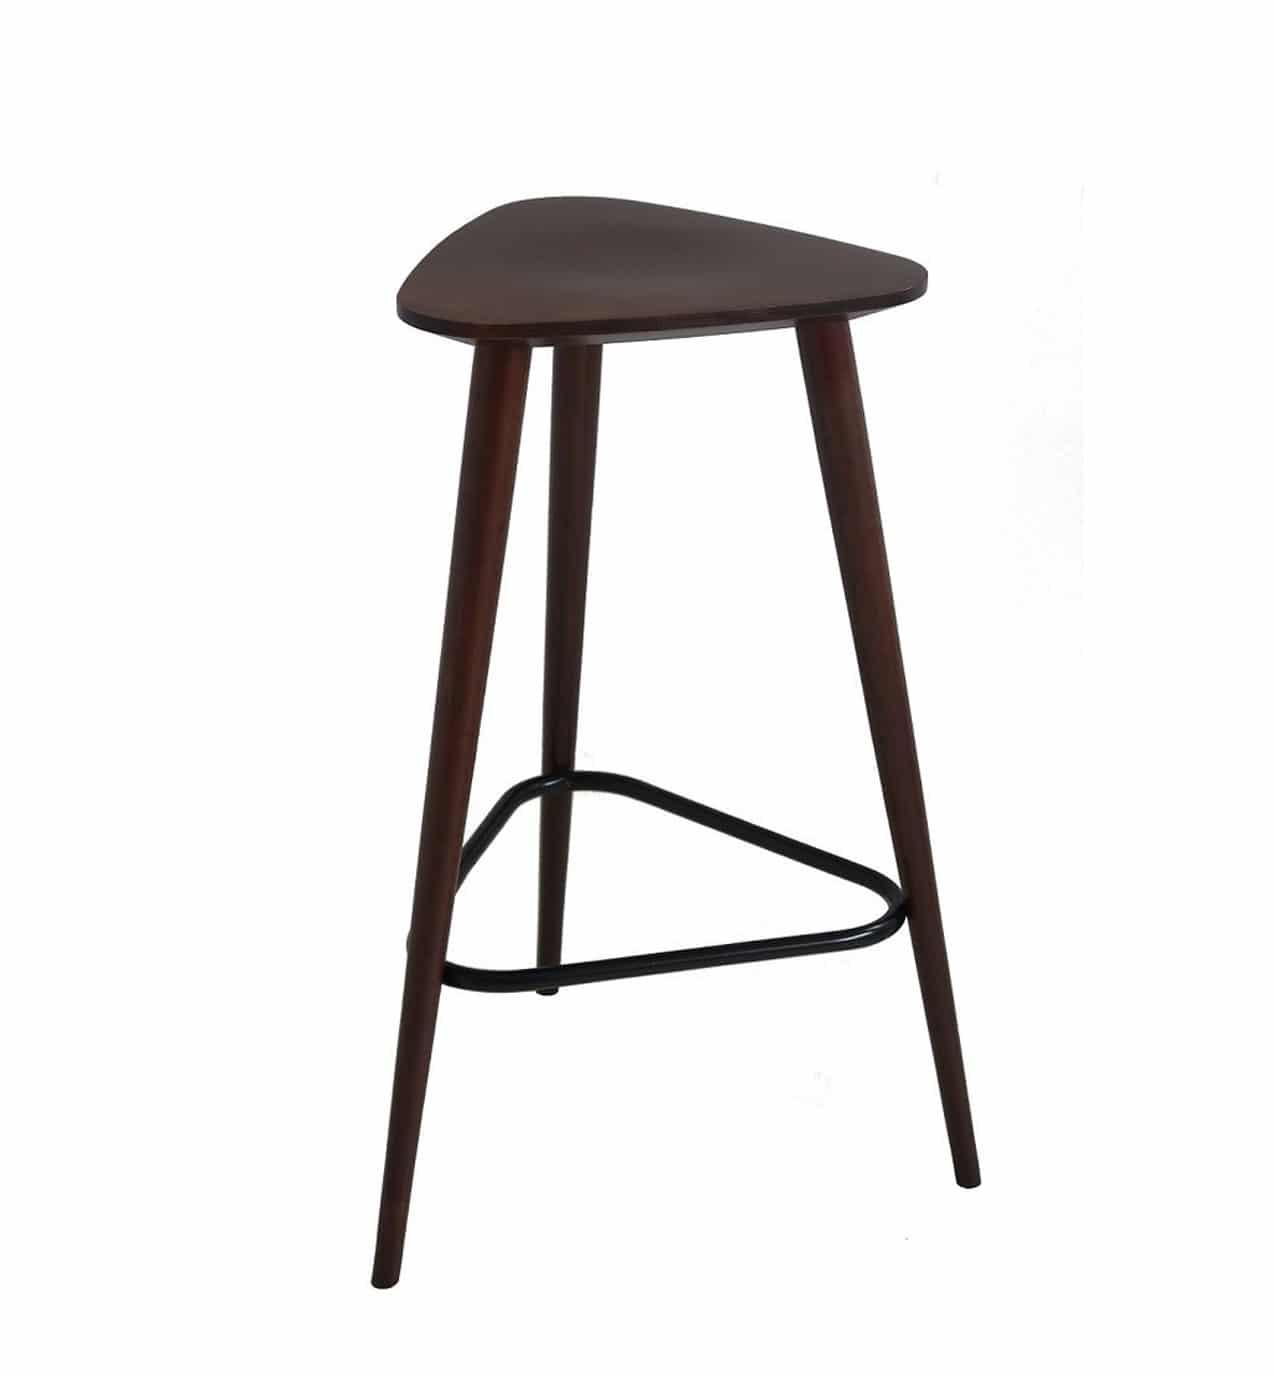 Triangle Bar Stools Backless Barstools Cafe Tables Inc